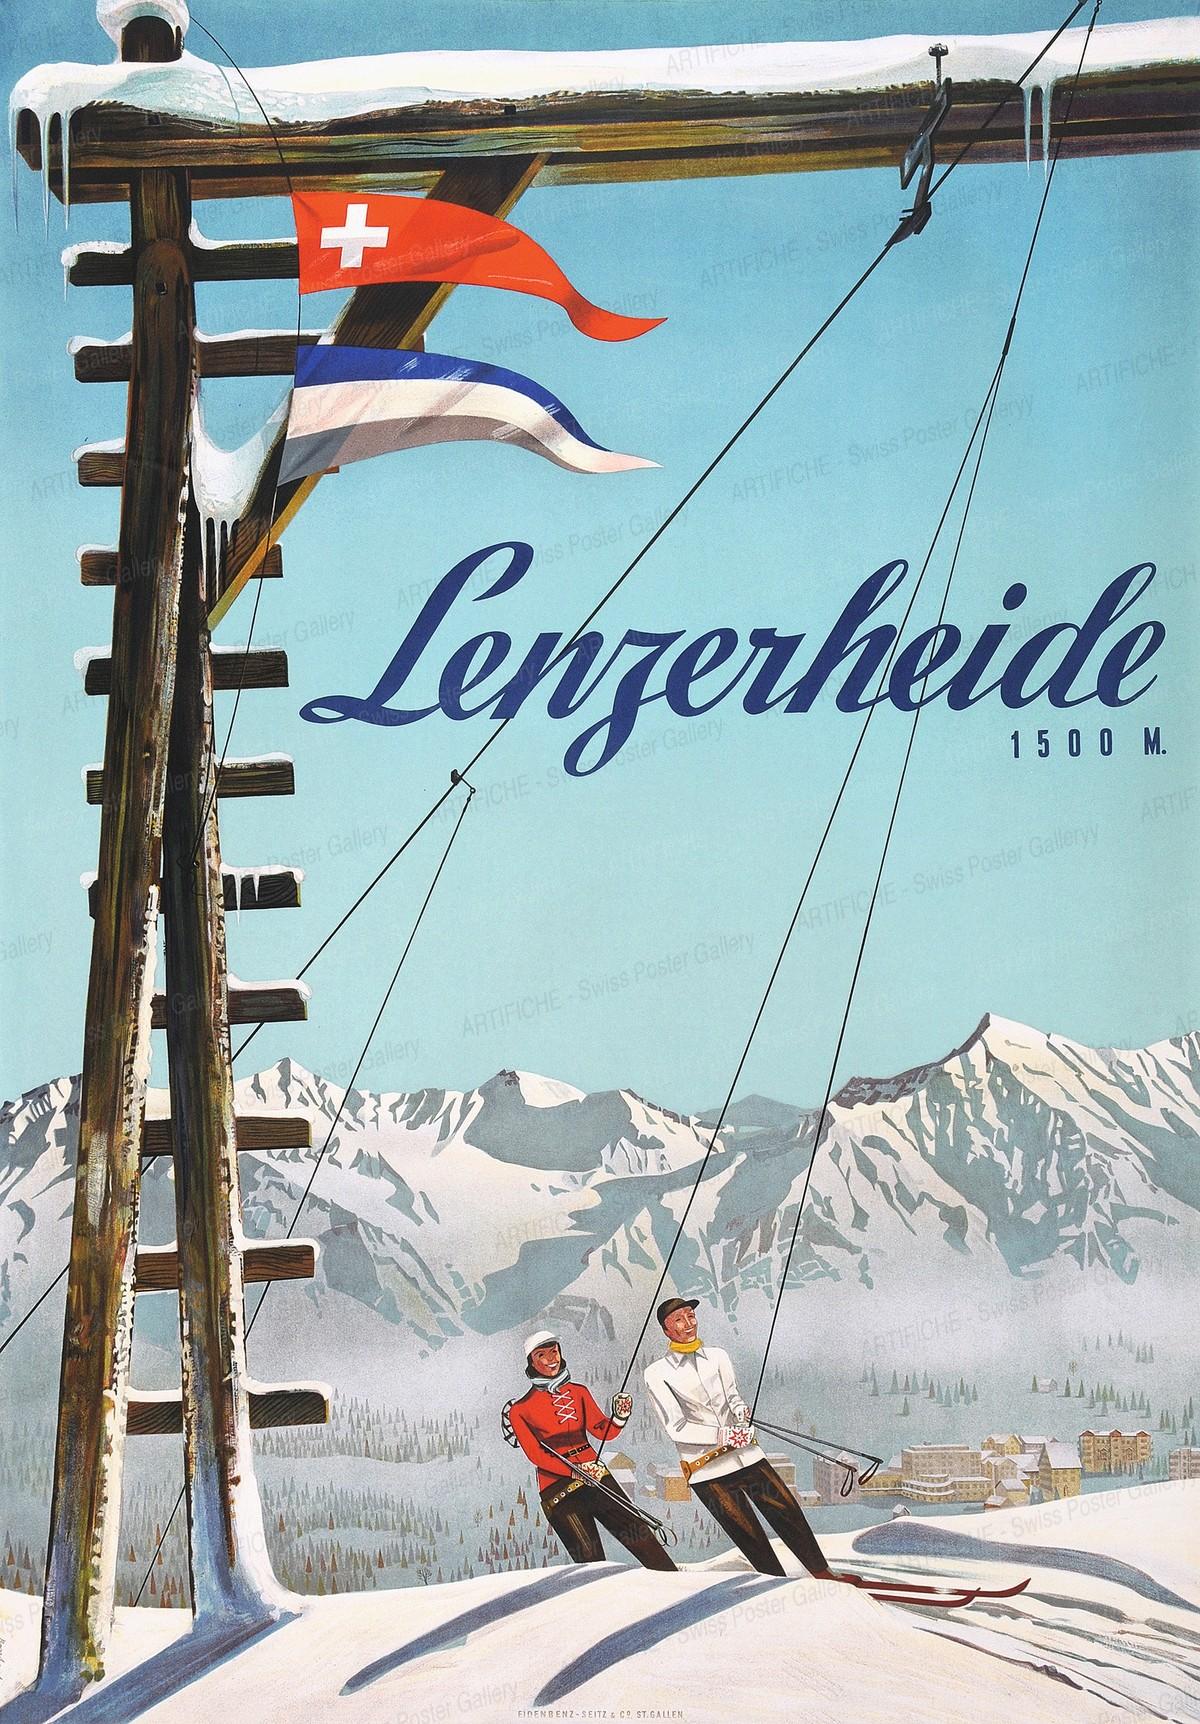 Lenzerheide 1500 M., Arnold Bosshard